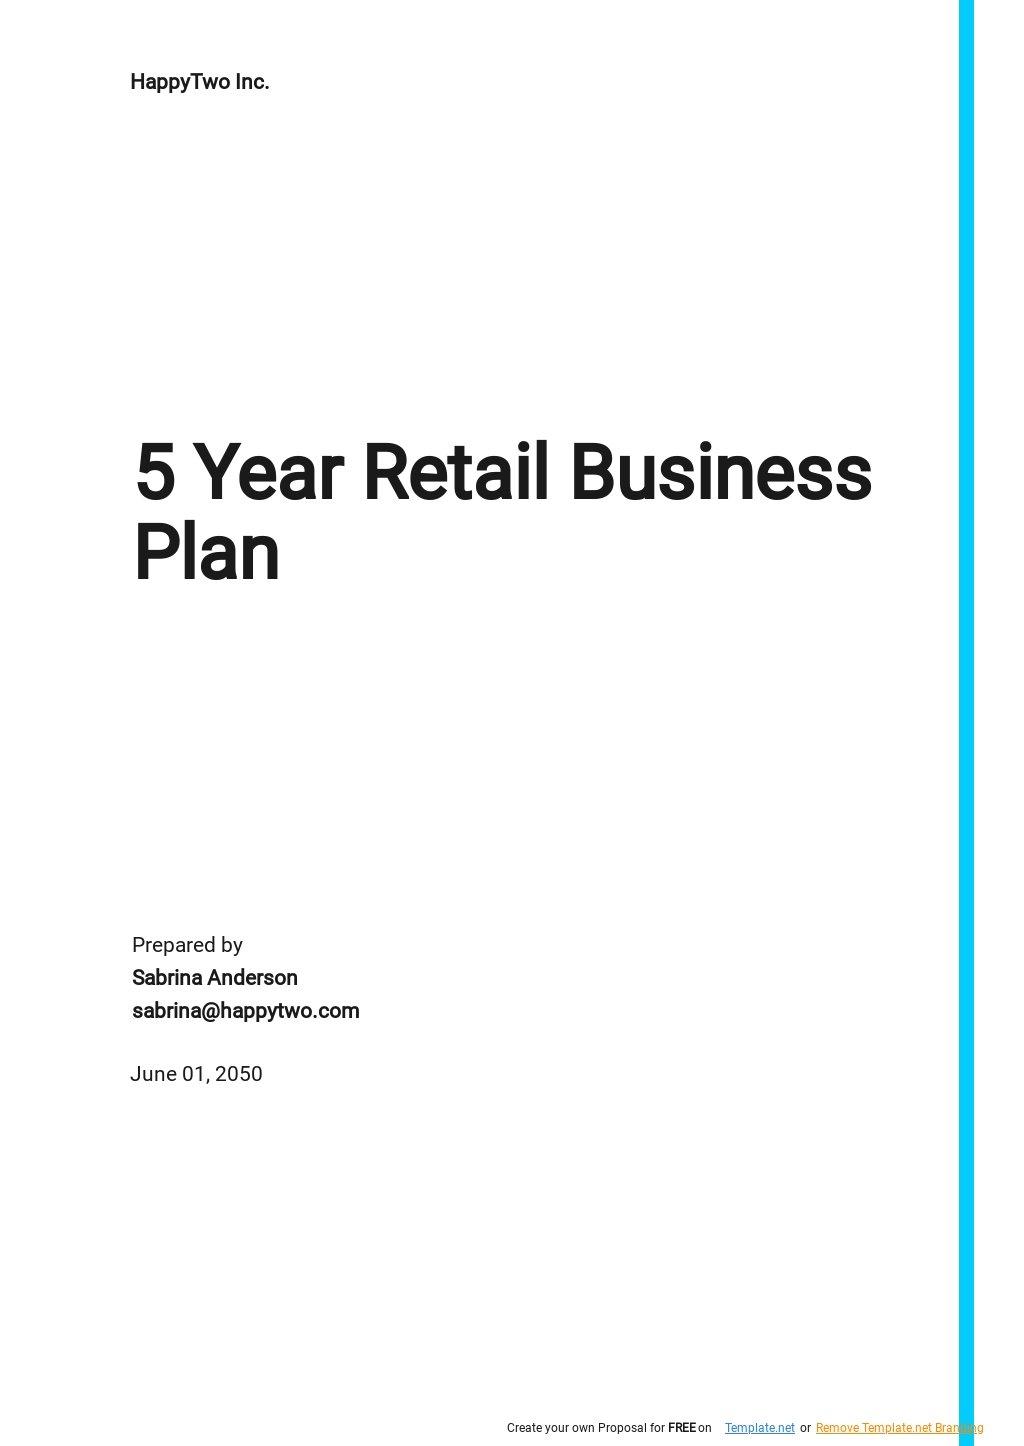 5 year Retail Business Plan Template.jpe